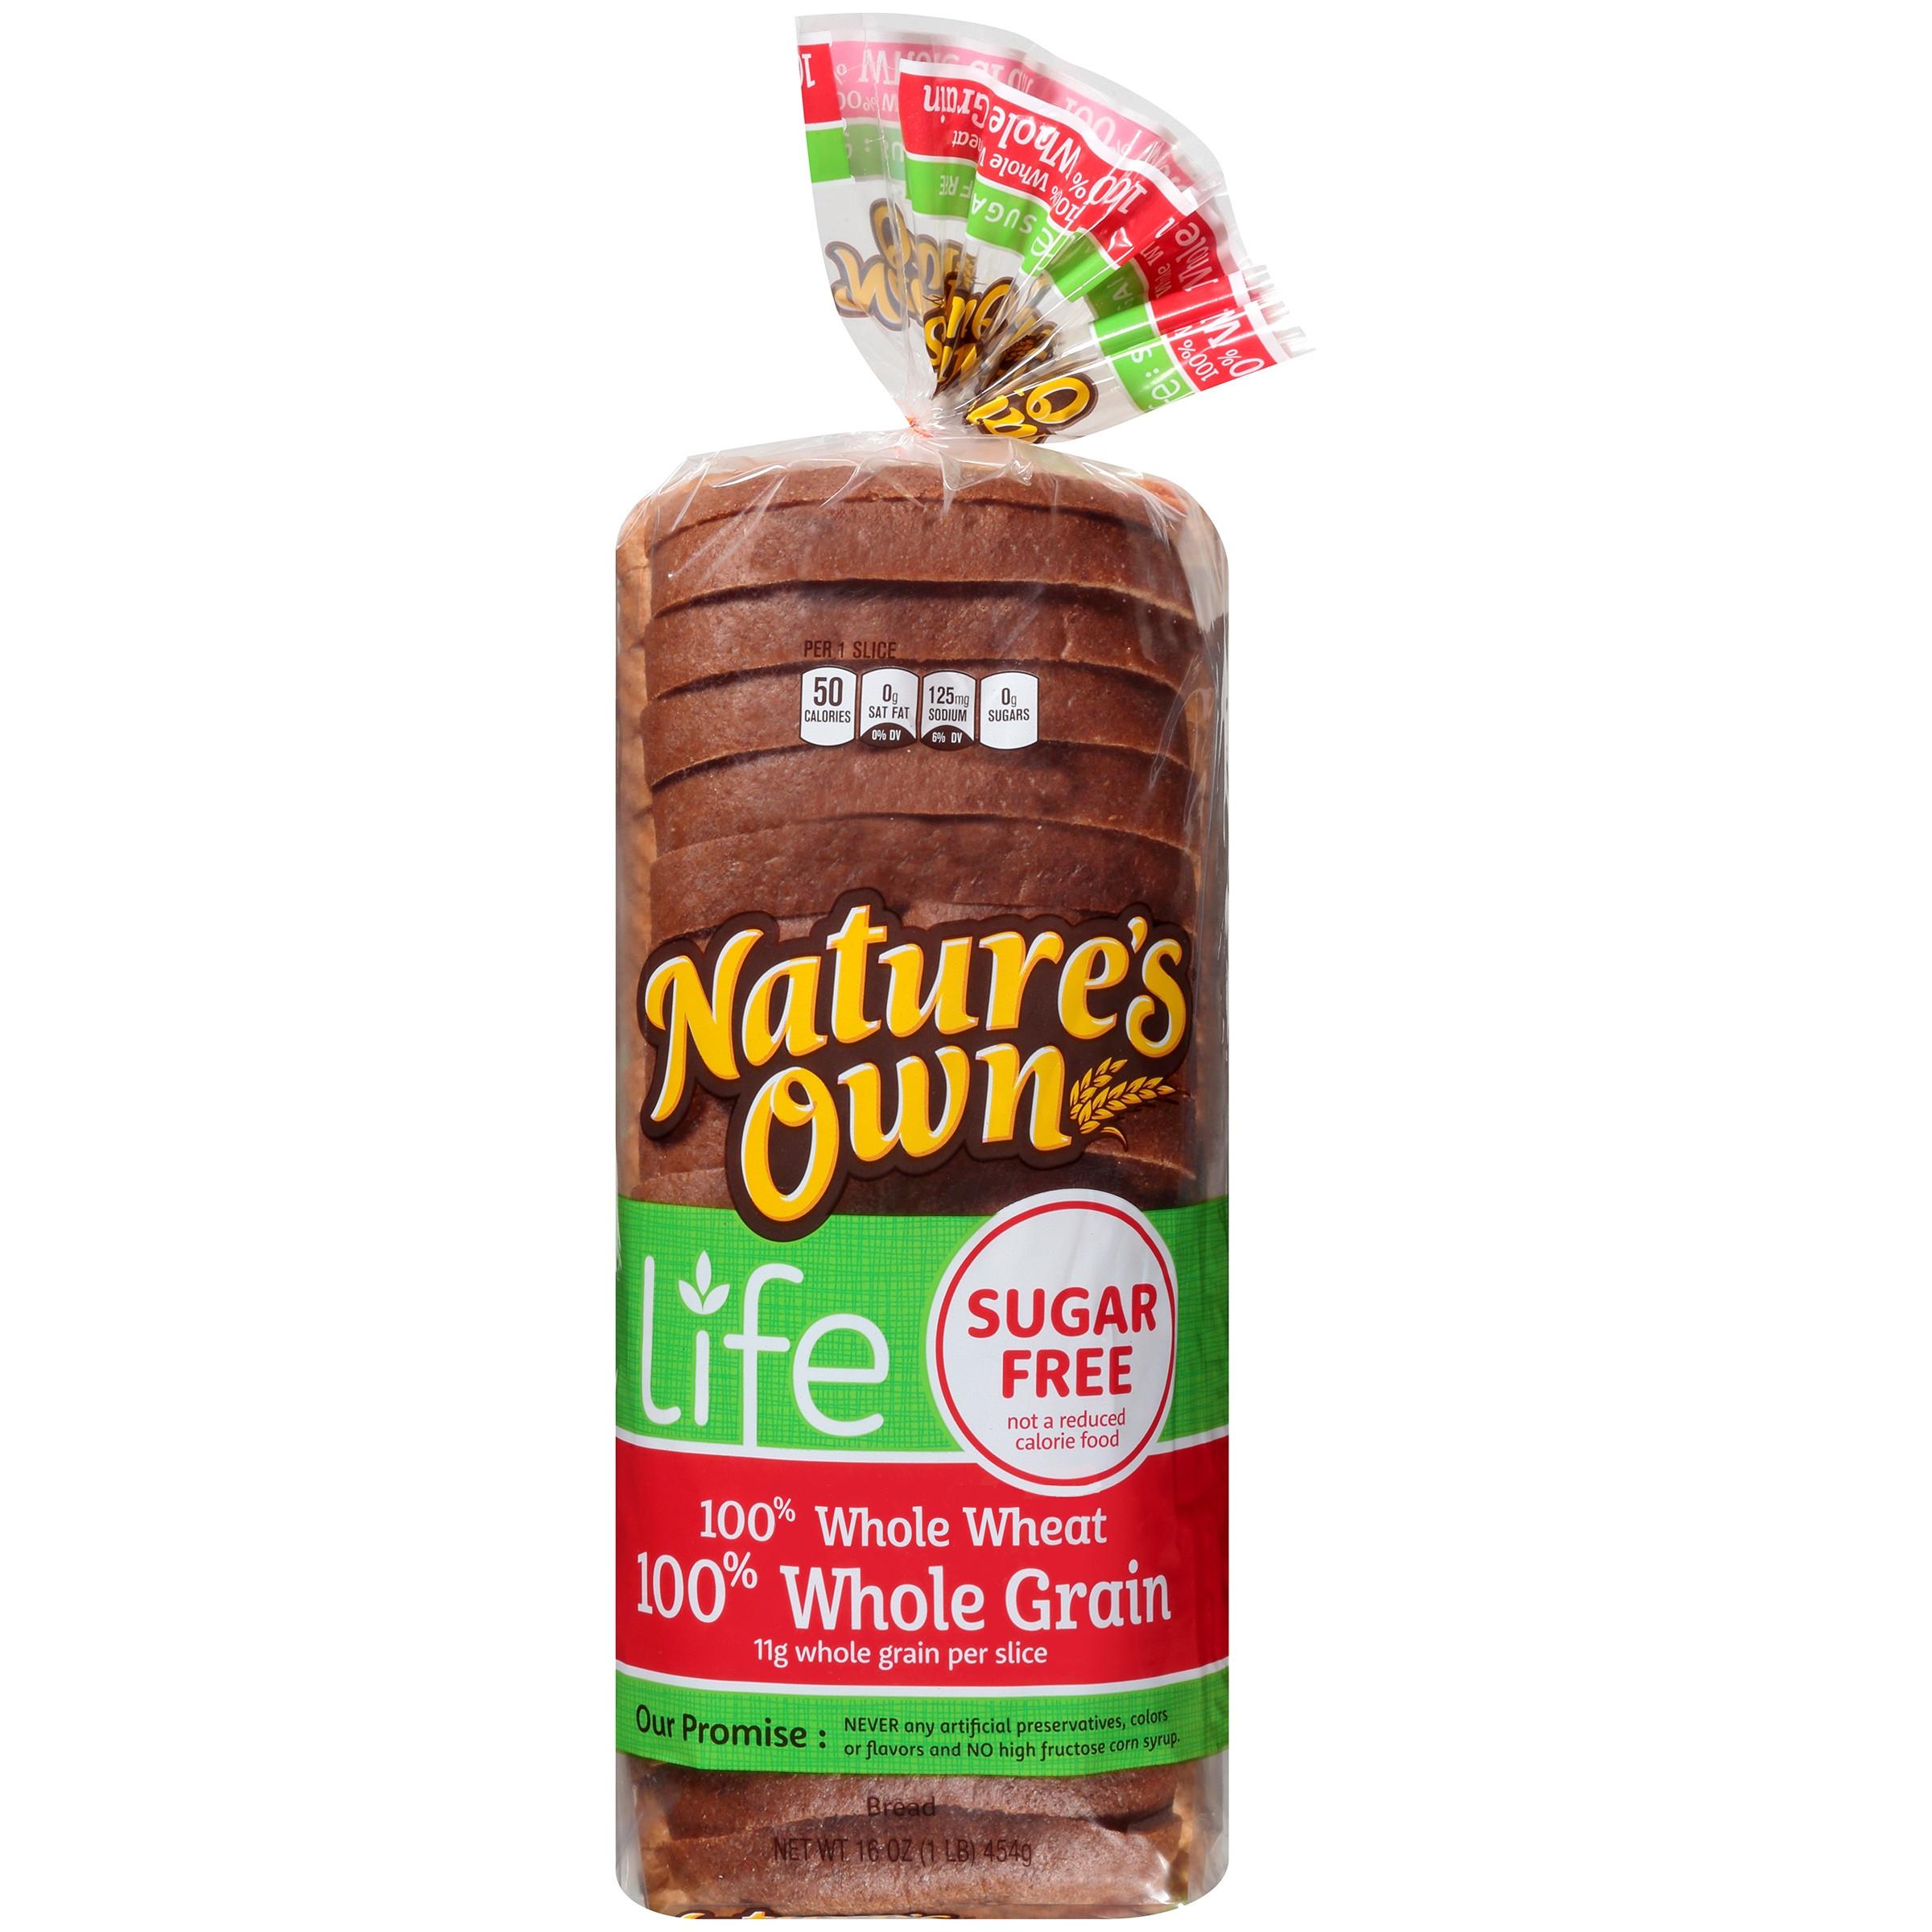 Healthy Life Bread Walmart  Nature s Own Life Sugar Free Whole Grain Bread 16 oz